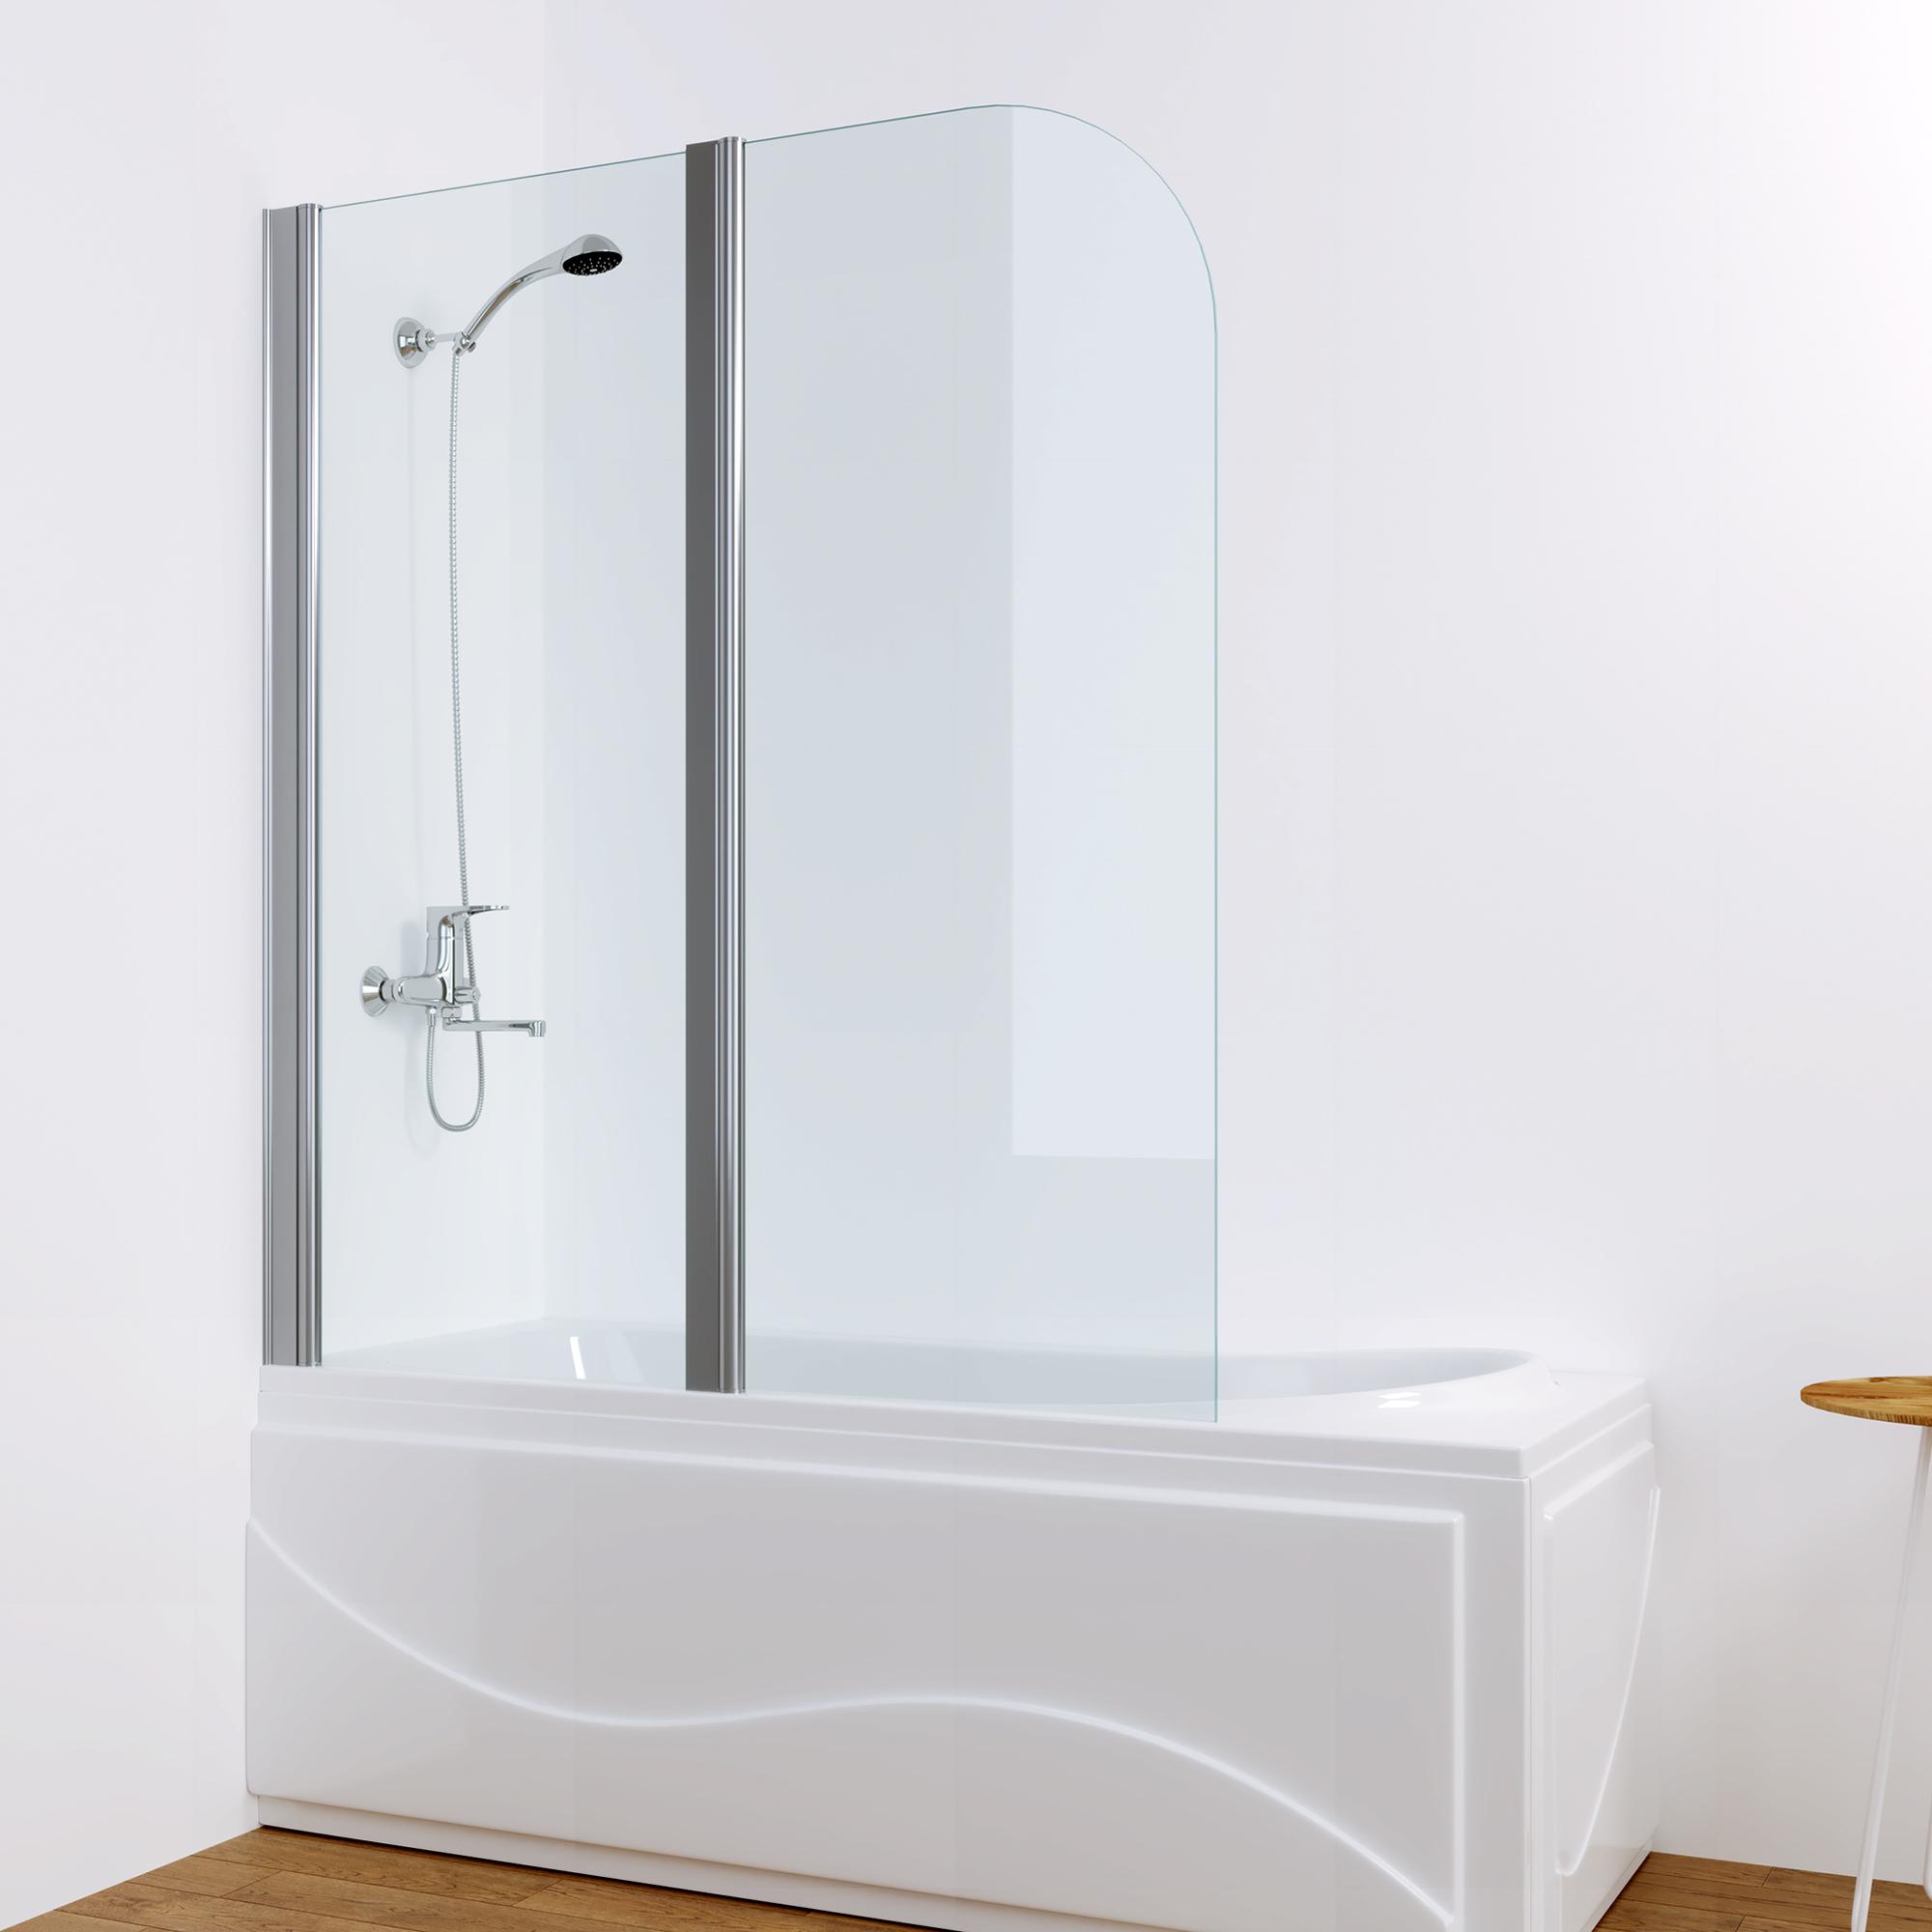 Duschabtrennung dusche badewannen aufsatz faltwand - Faltwand dusche ...